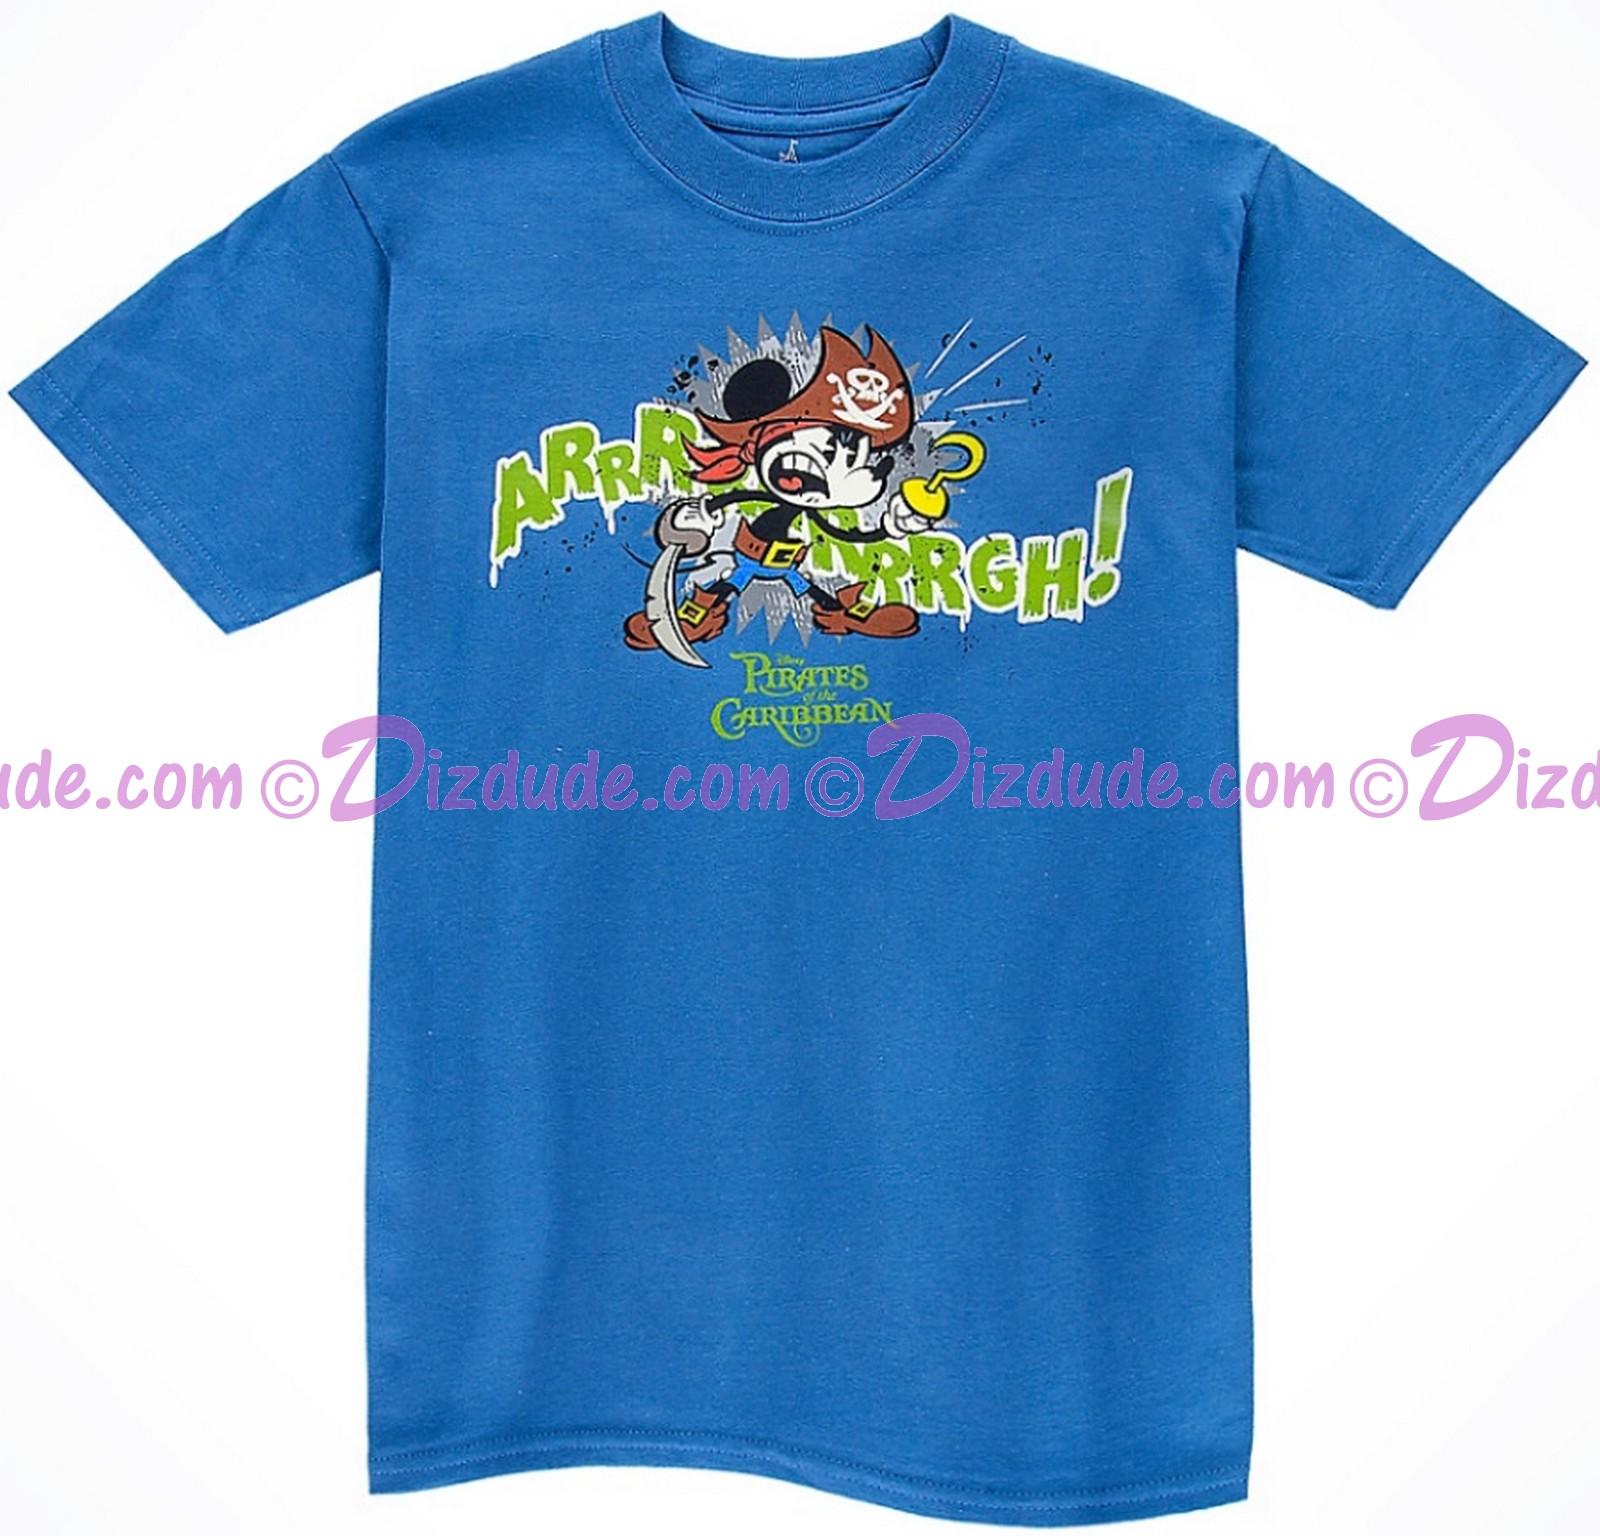 Vintage Disney Arrrrrrrrrrrrgh! Pirate Mickey Mouse Youth T-shirt (Tee, Tshirt or T shirt)